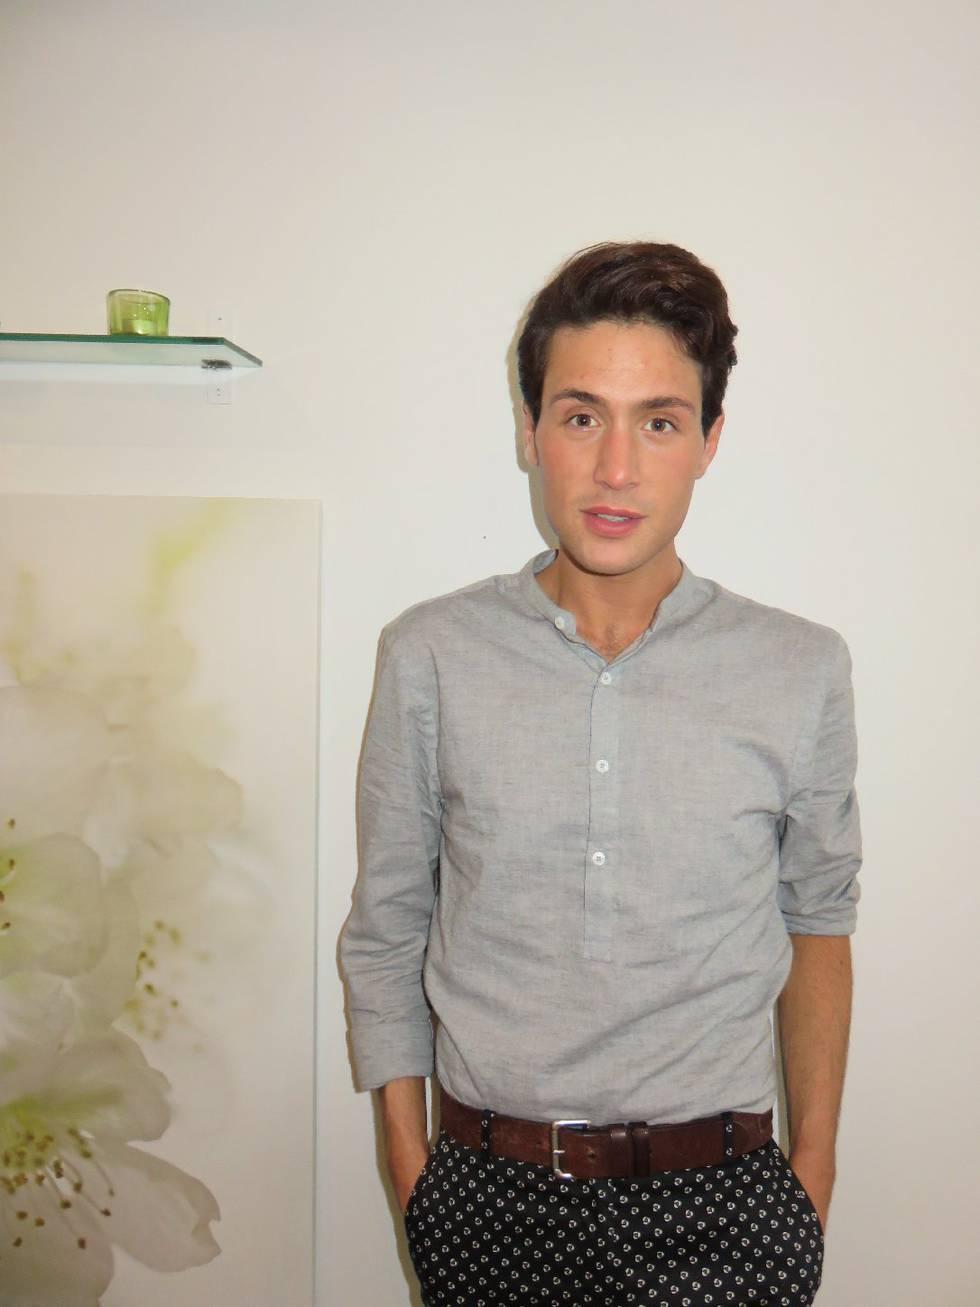 Moderedaktör på Blogozine